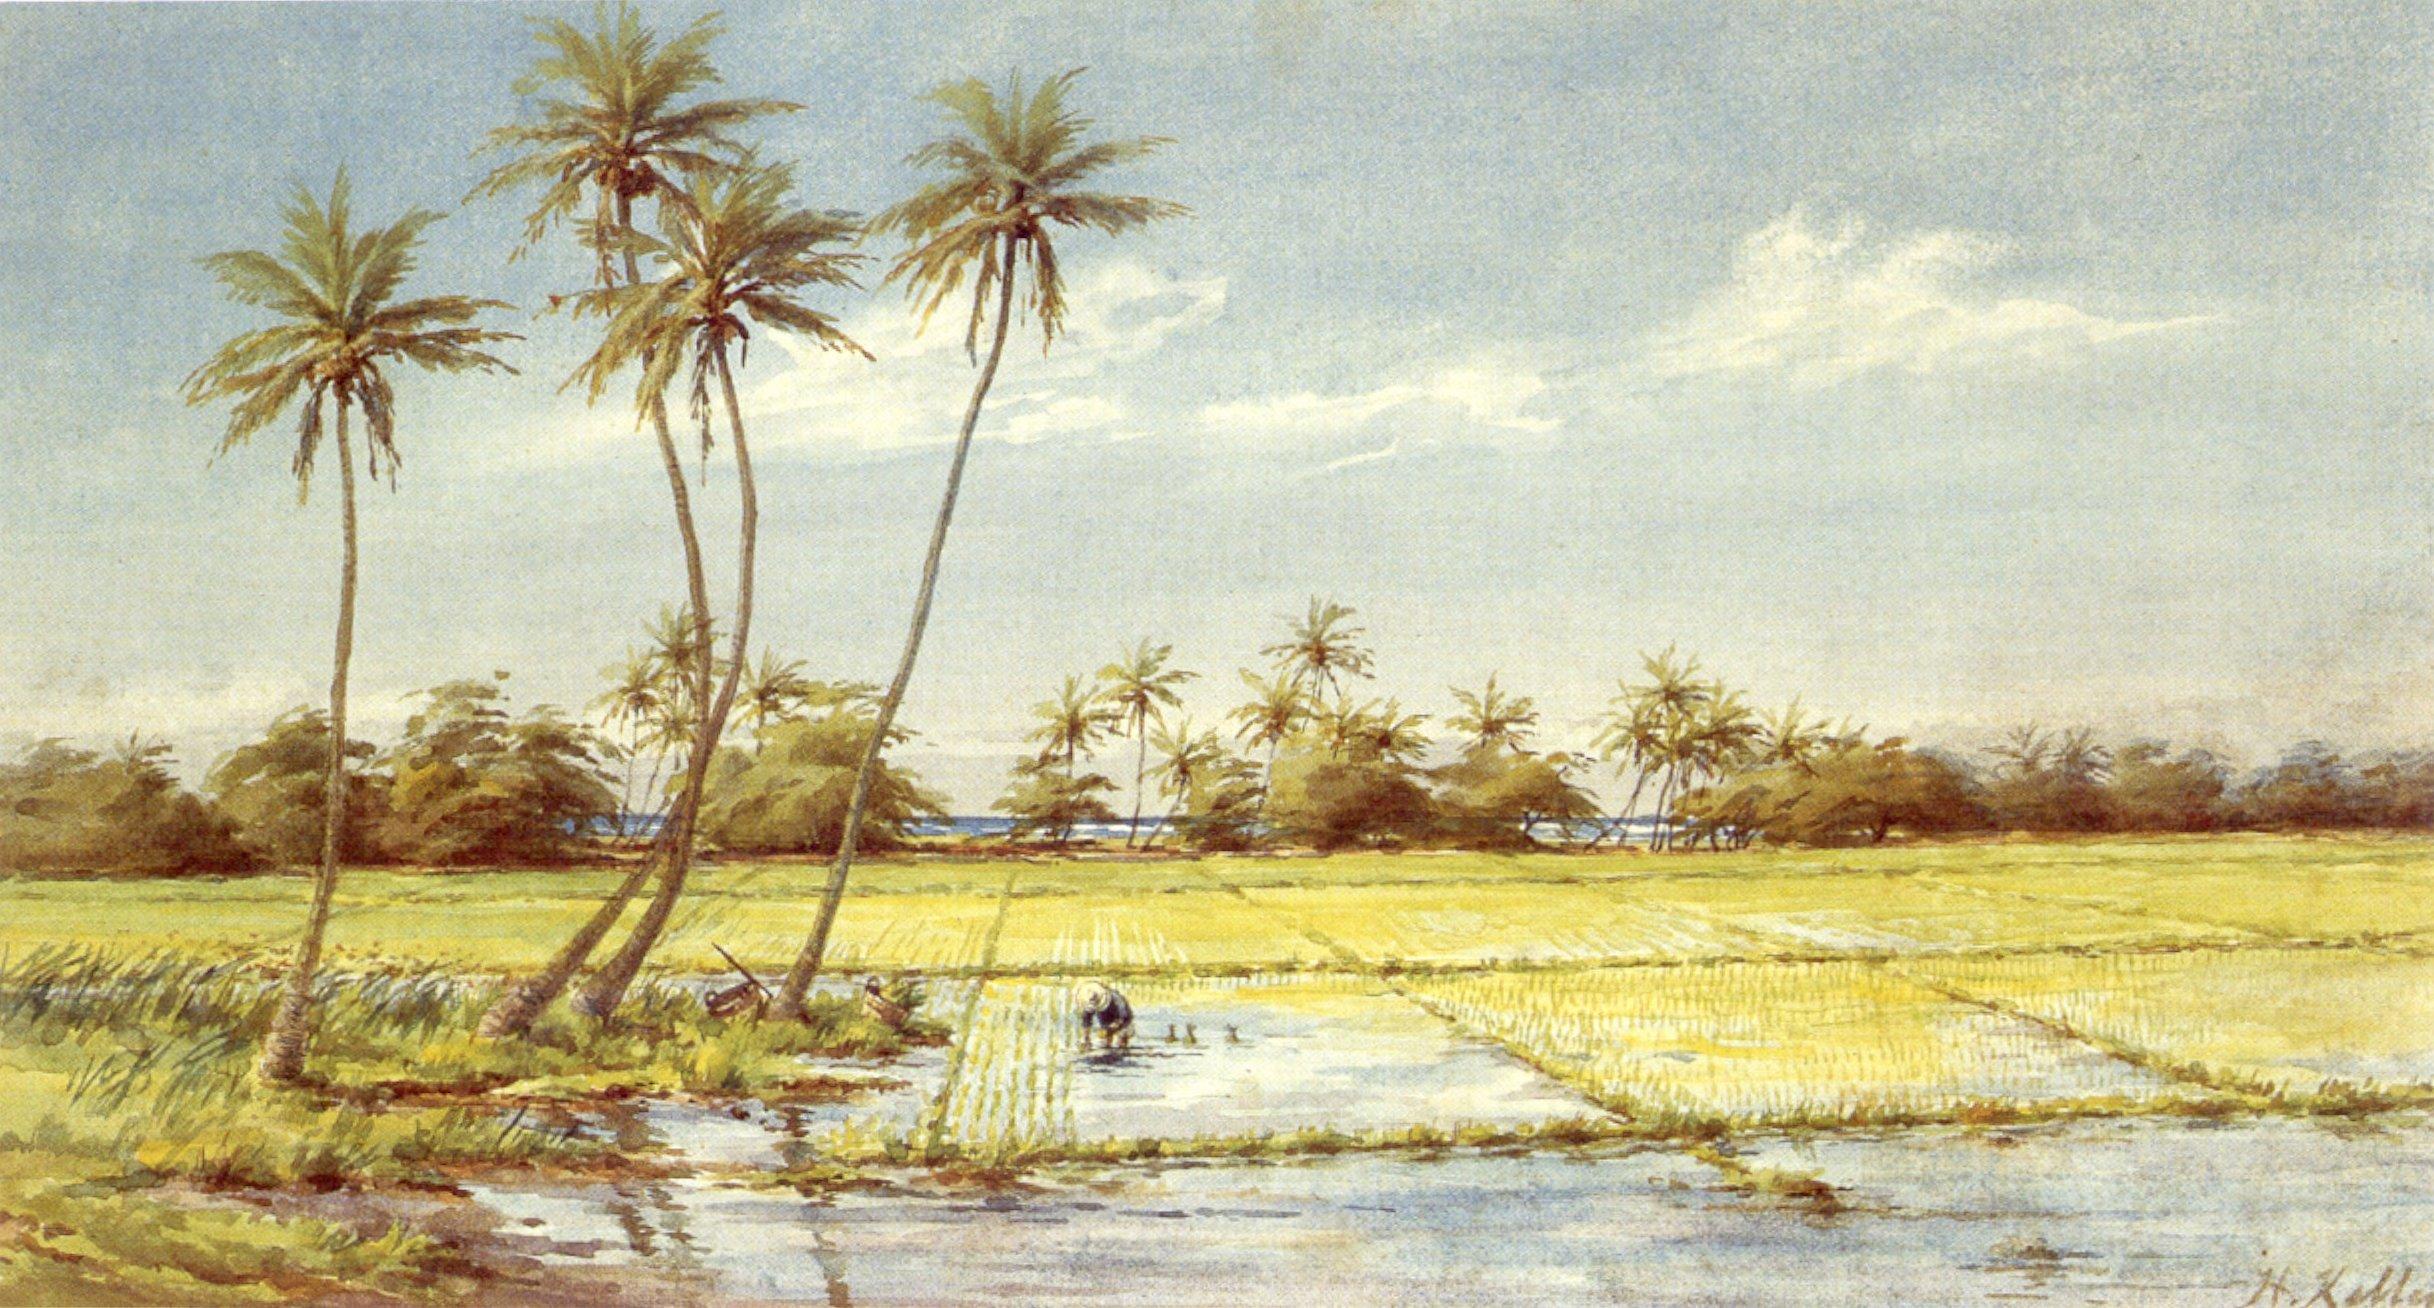 History of watercolor art - File Helen Whitney Kelley Rice Paddies Watercolor 1890 Honolulu